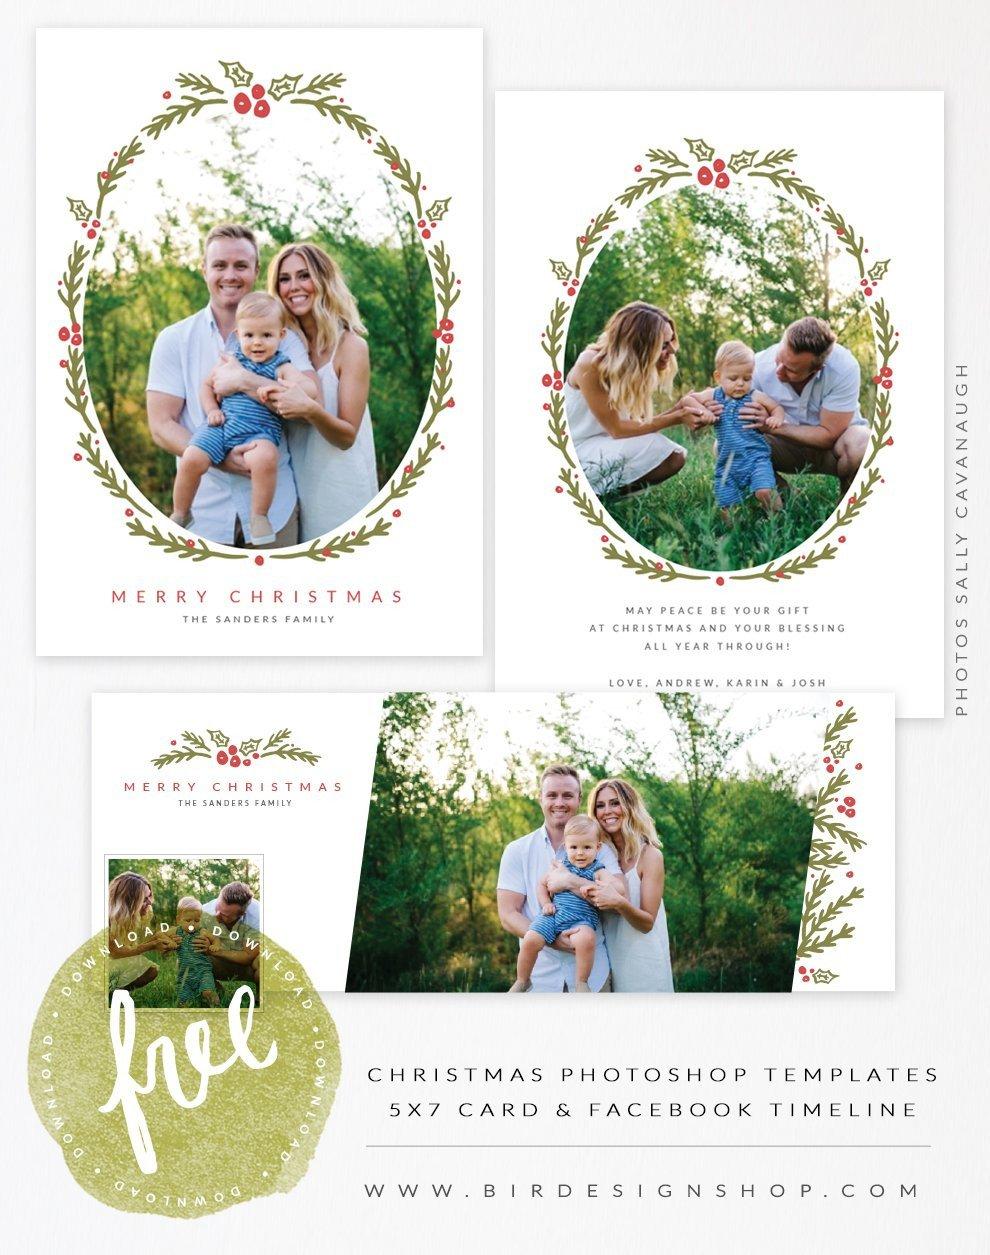 Photoshop Christmas Card Templates August Freebie Christmas Card & Fb Timeline Templates